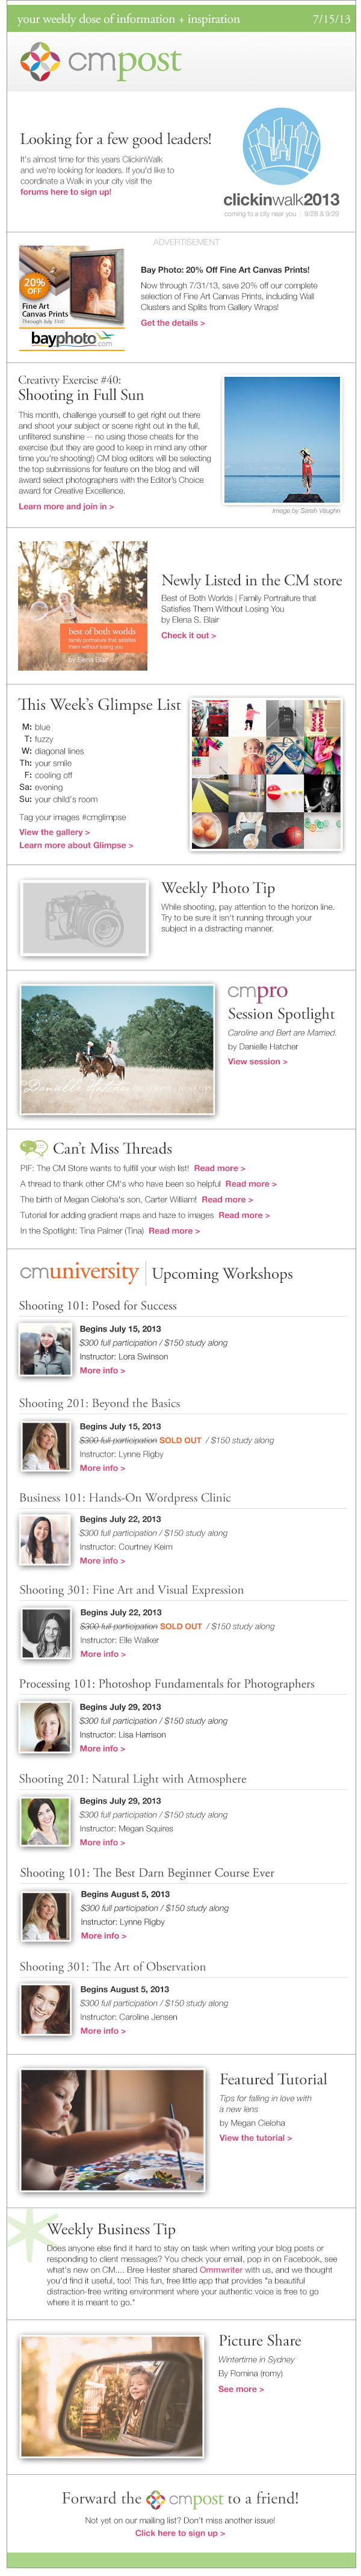 July creativity challenge, seeking ClickinWalk leaders, and loving a new lens